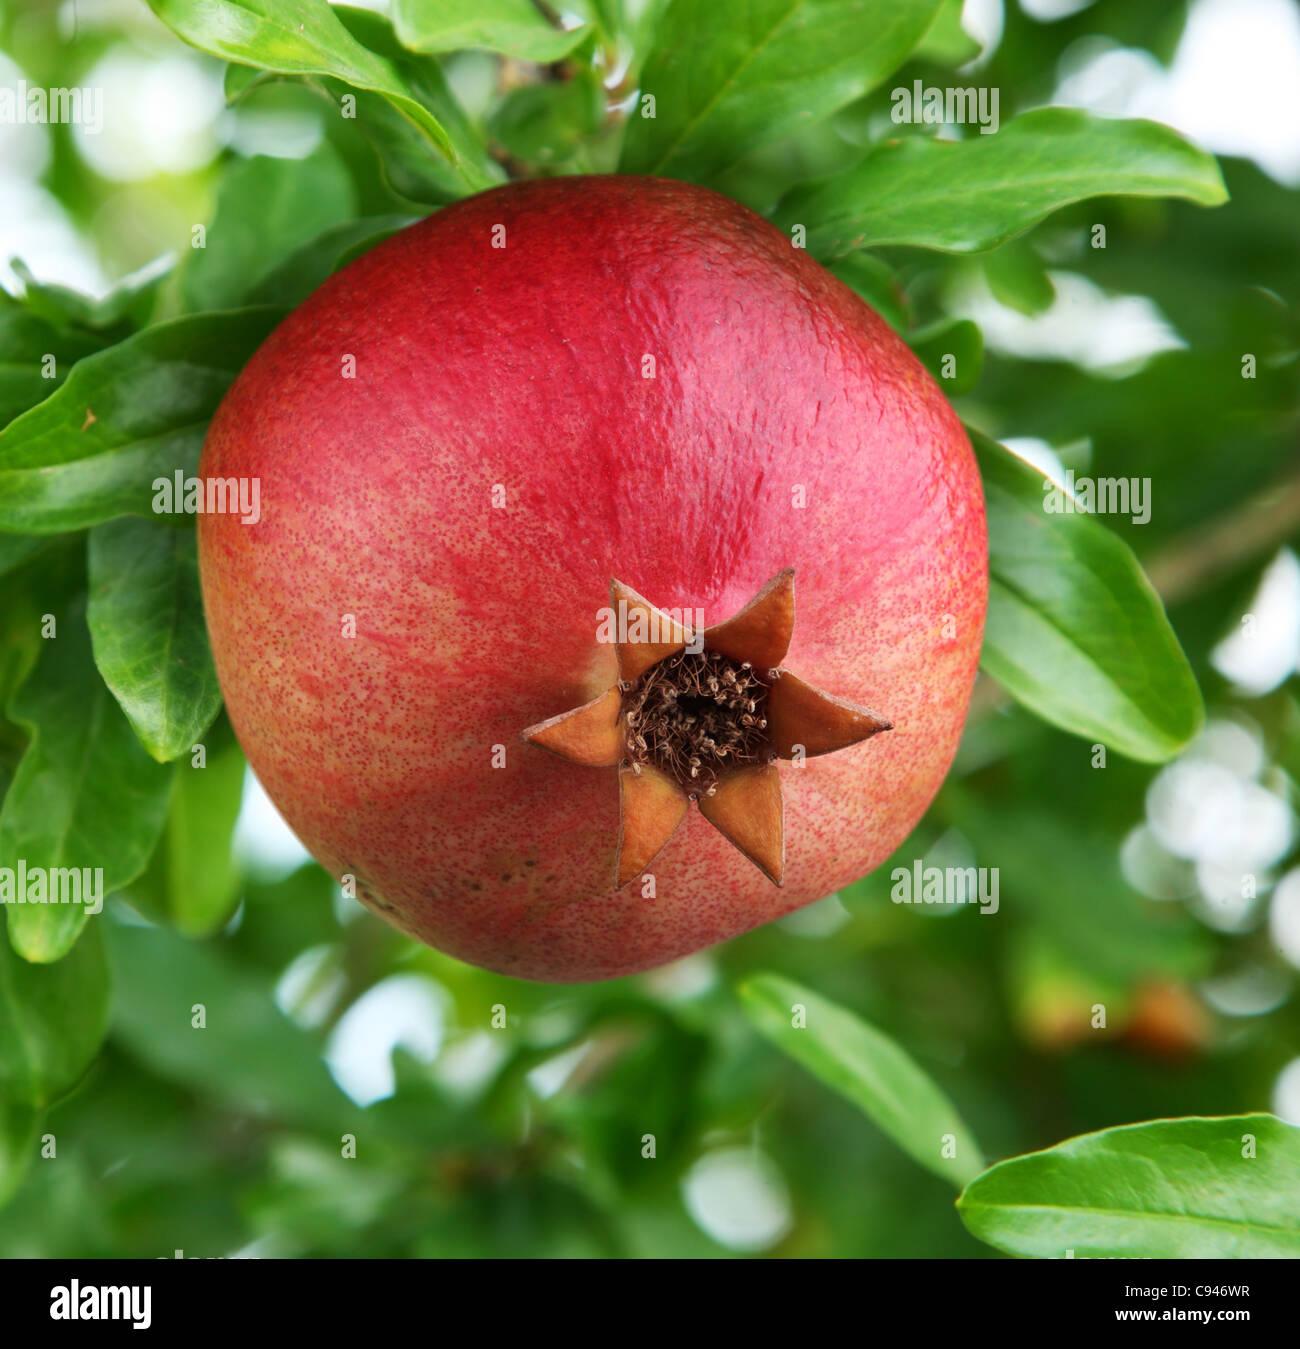 Ripe pomegranate on a tree. - Stock Image